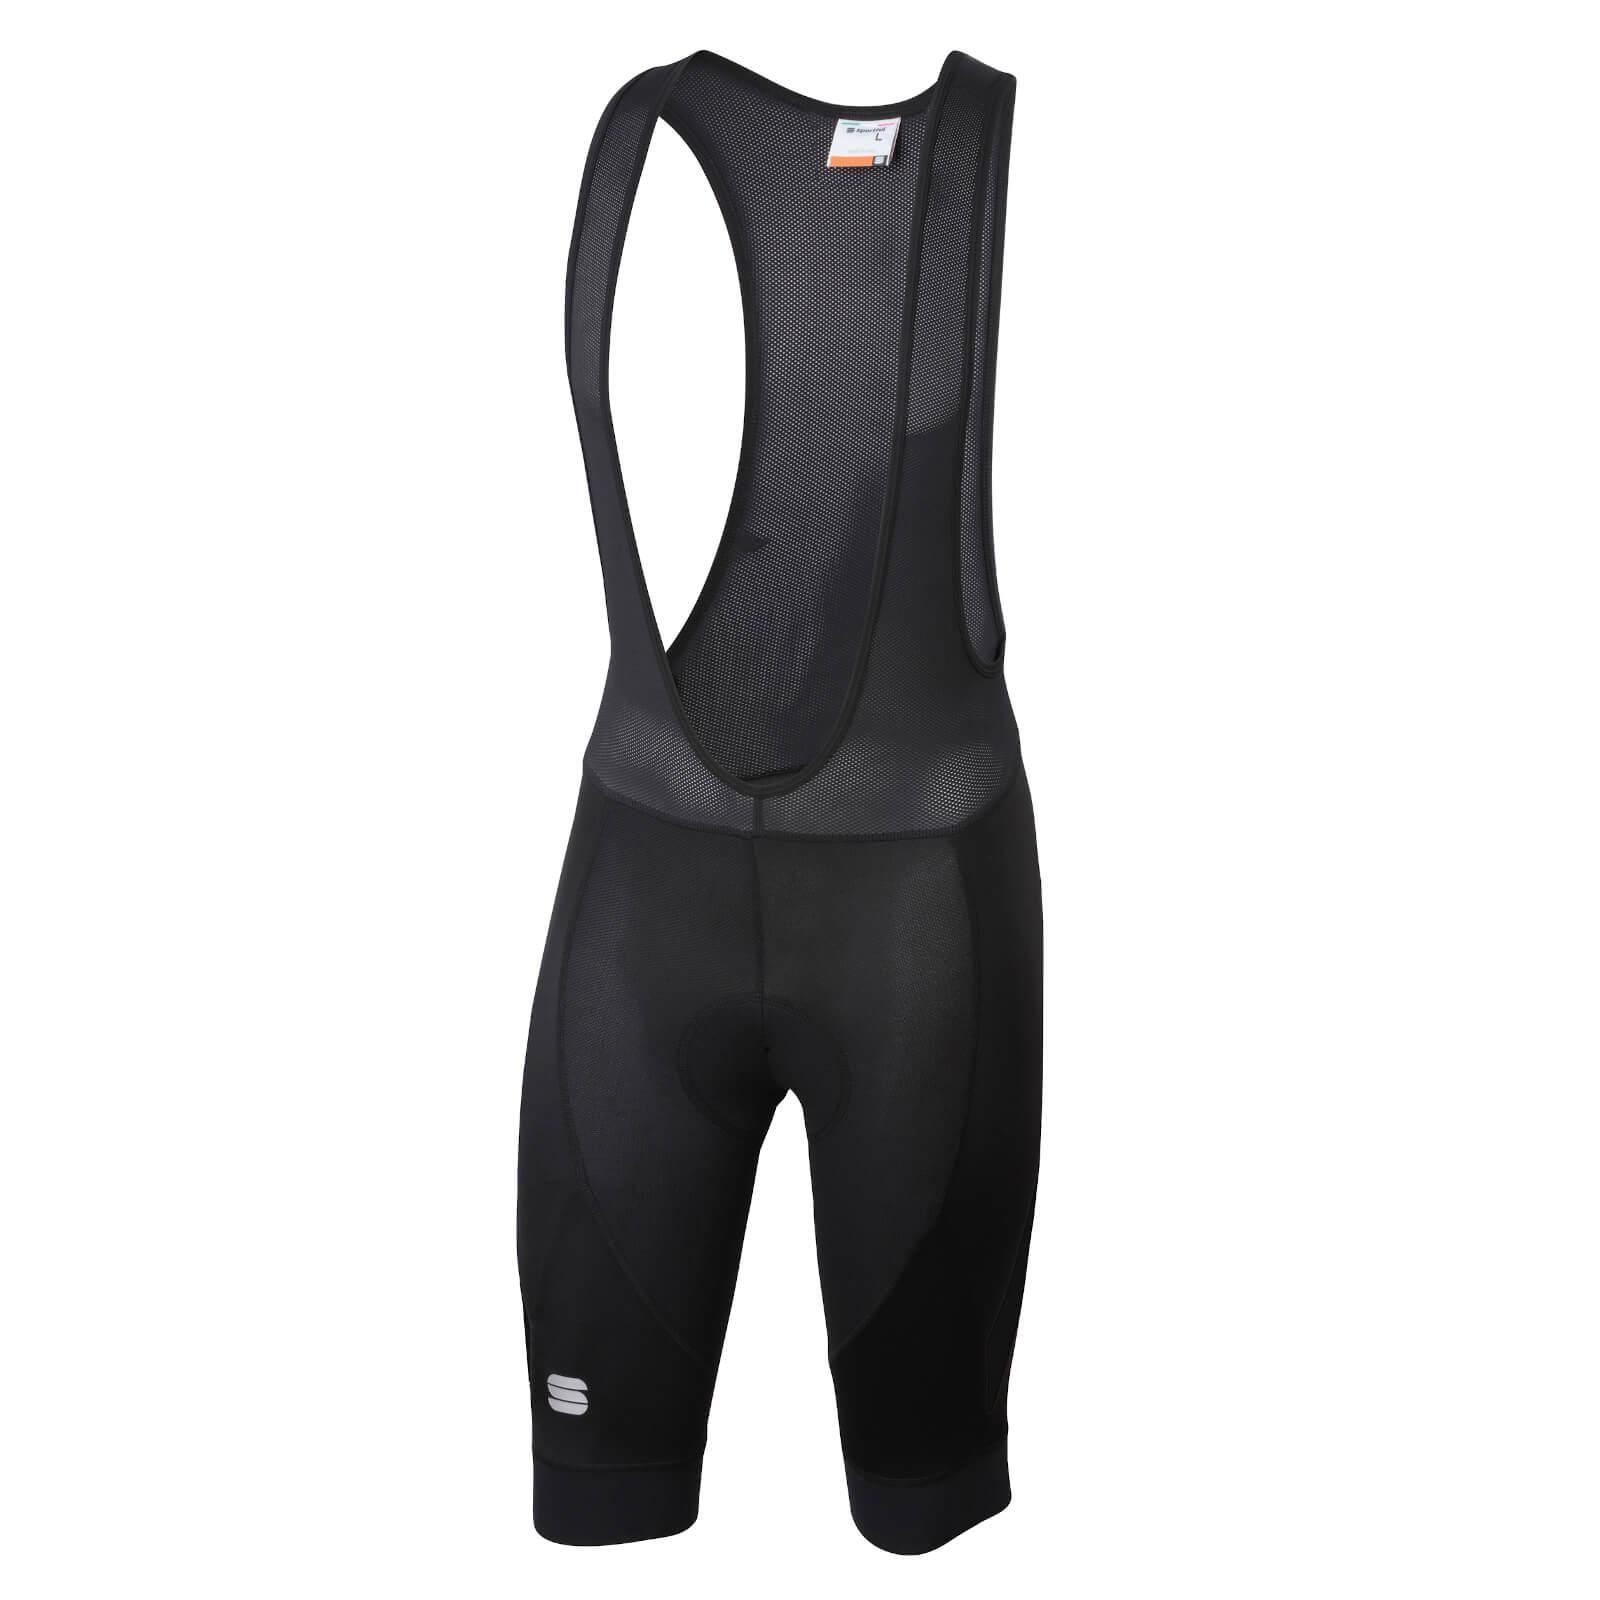 Sportful Neo Bib Shorts - XXL